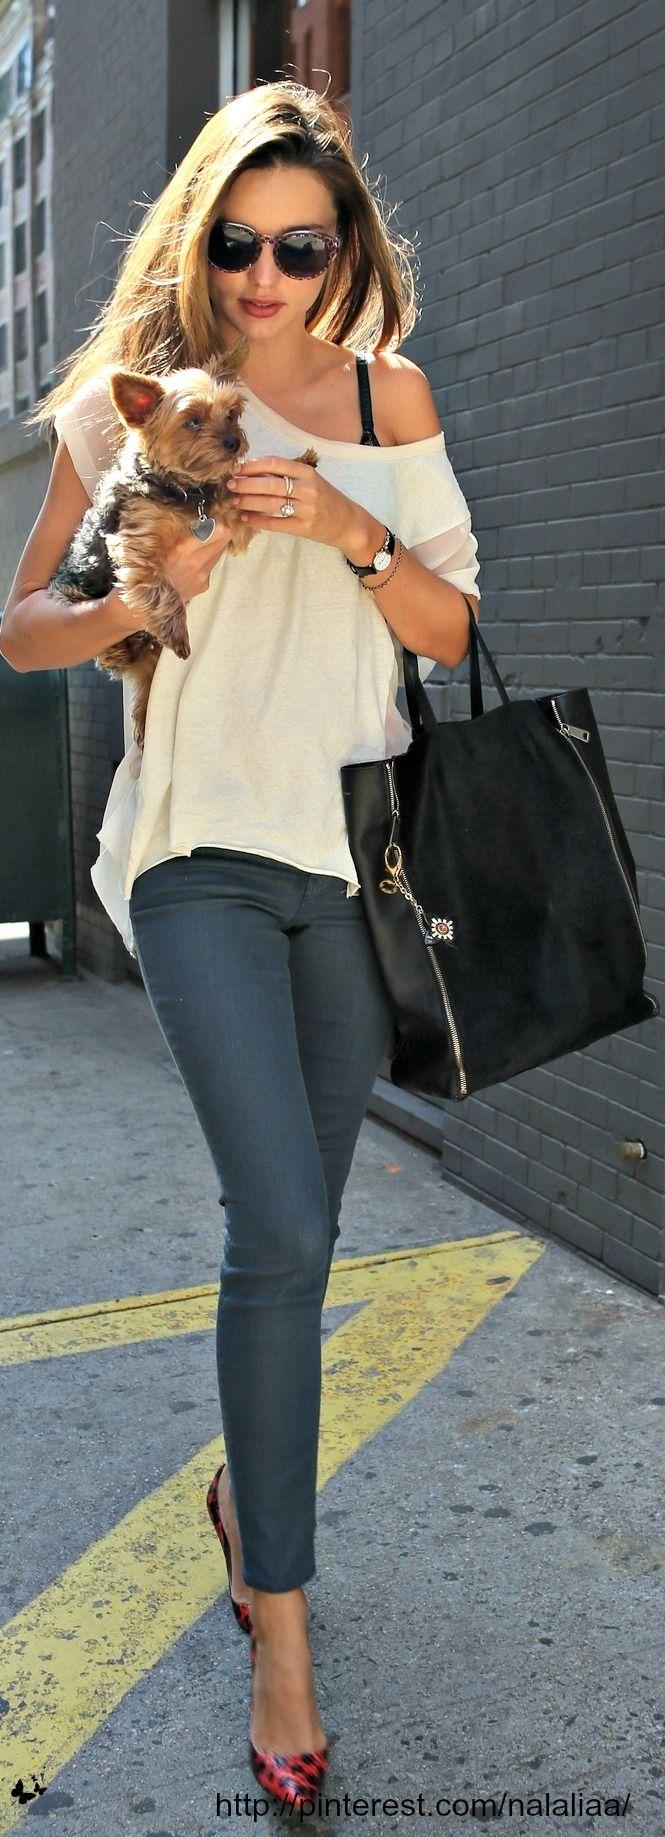 Street style - Miranda Kerr - Celine bag <3 na